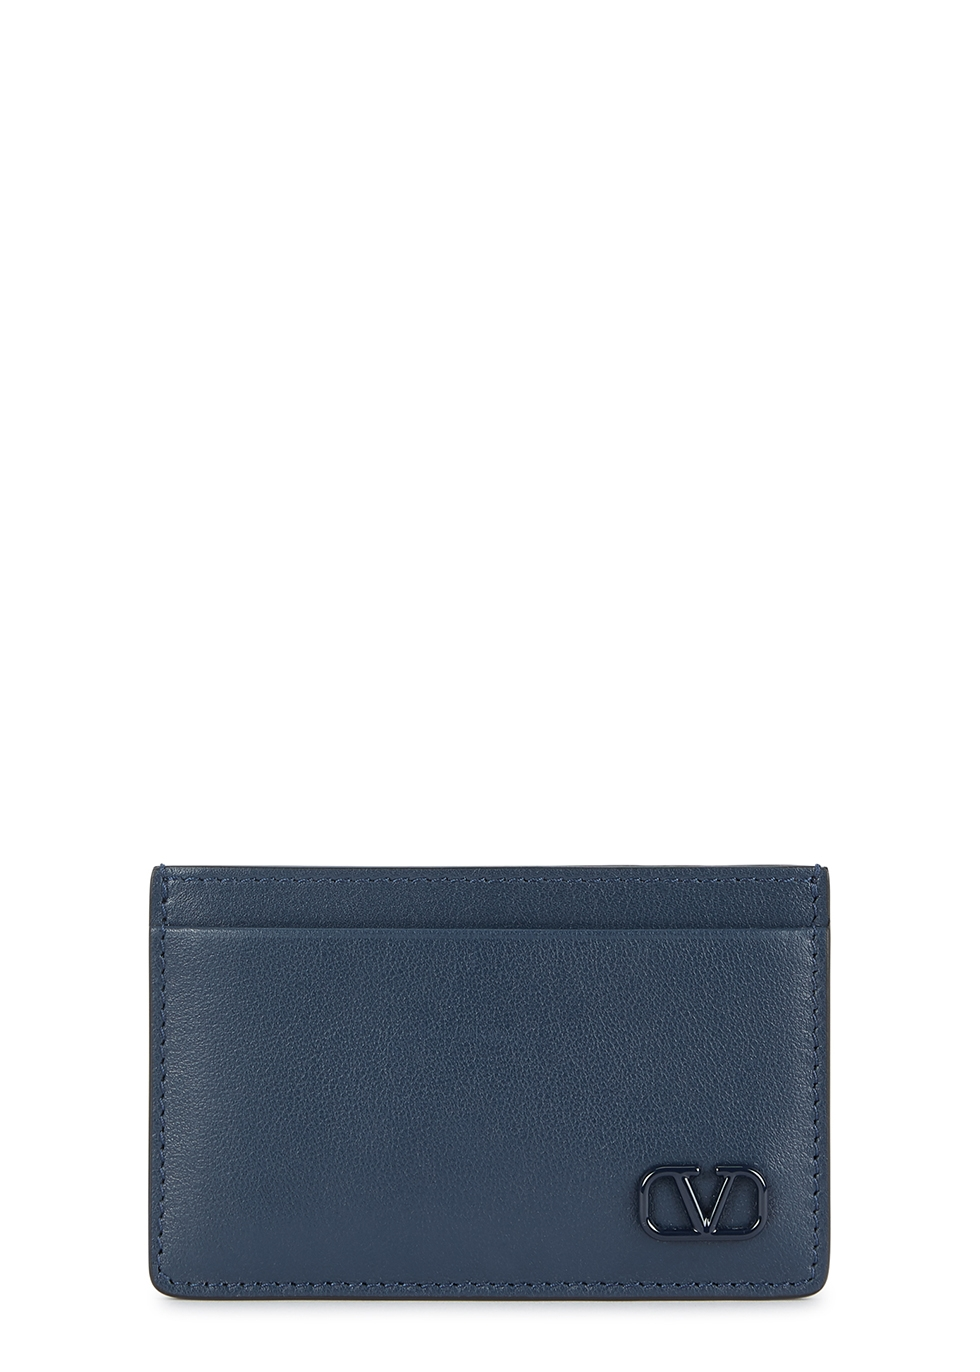 Valentino Garavani VLogo leather card holder